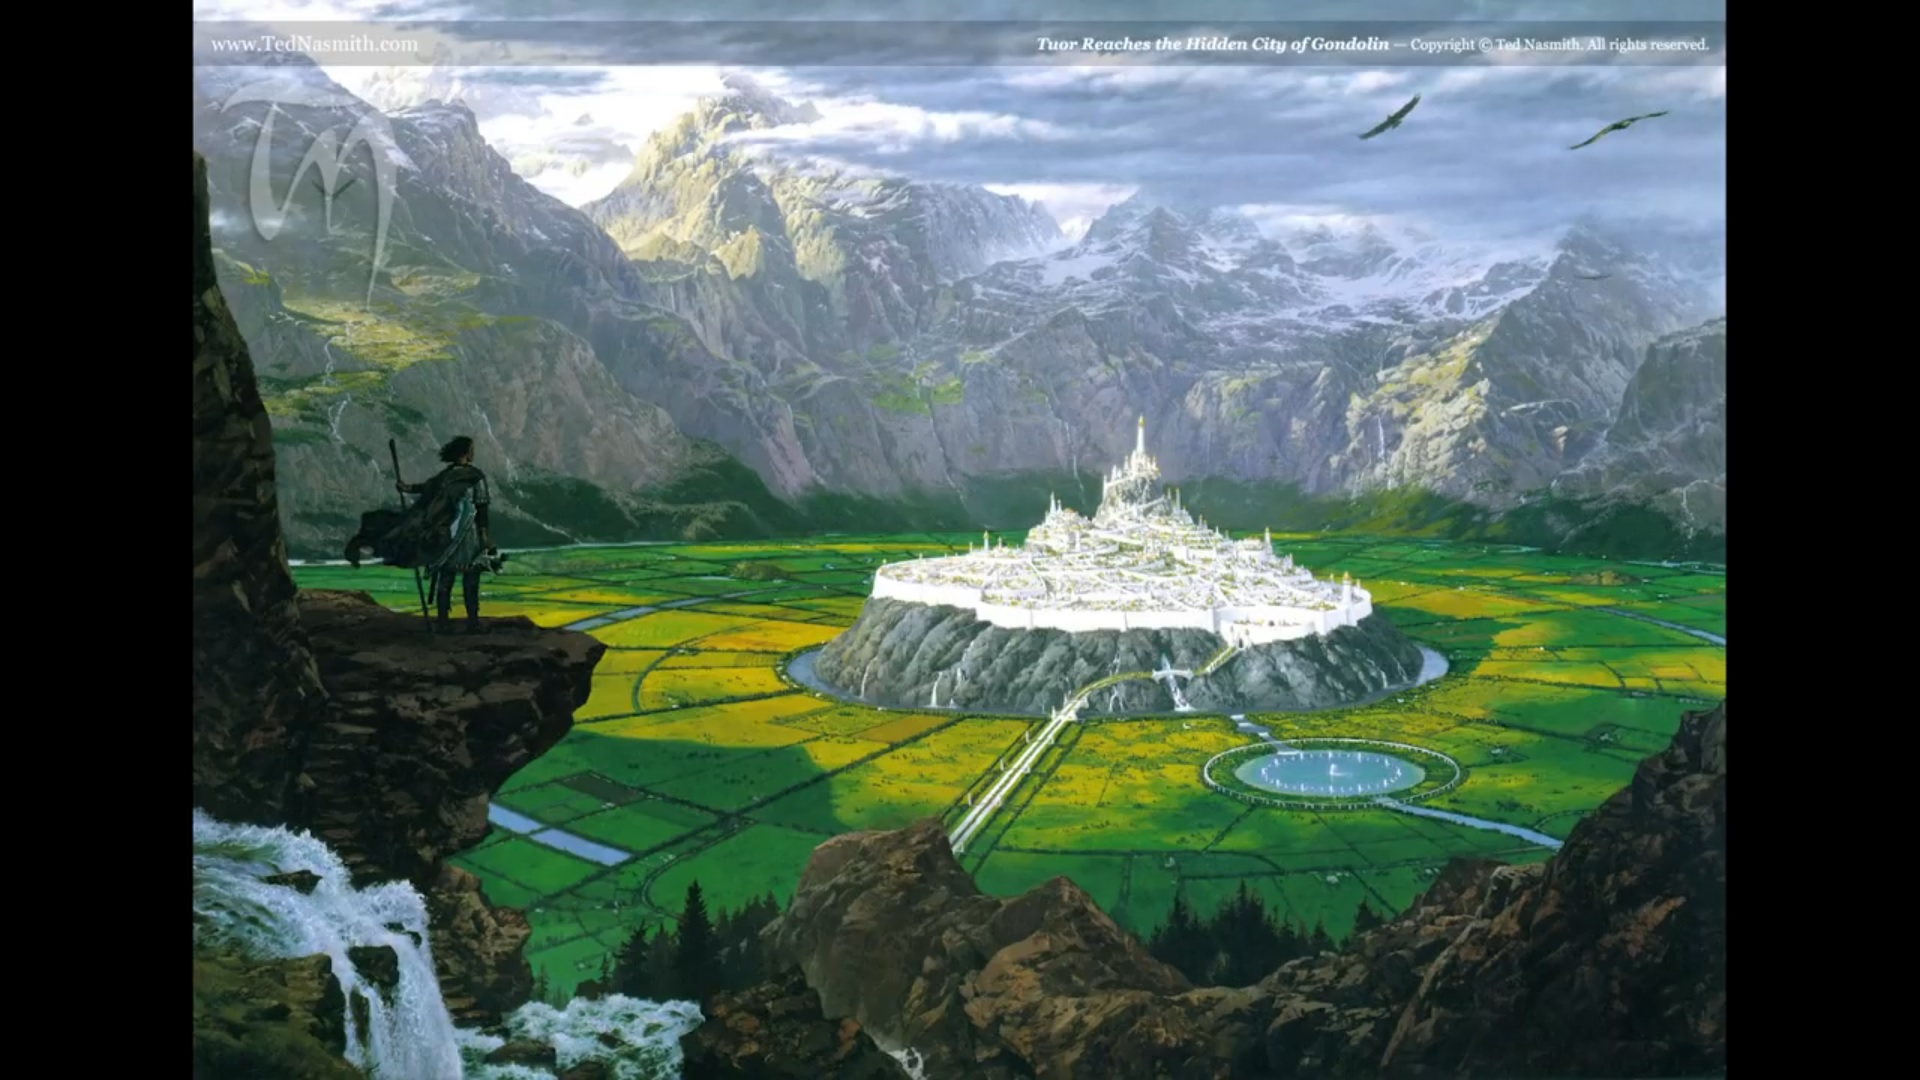 Exploring Middle-Earth: The Fall of Gondolin (Изучение Средиземья: Падение Гондолина)